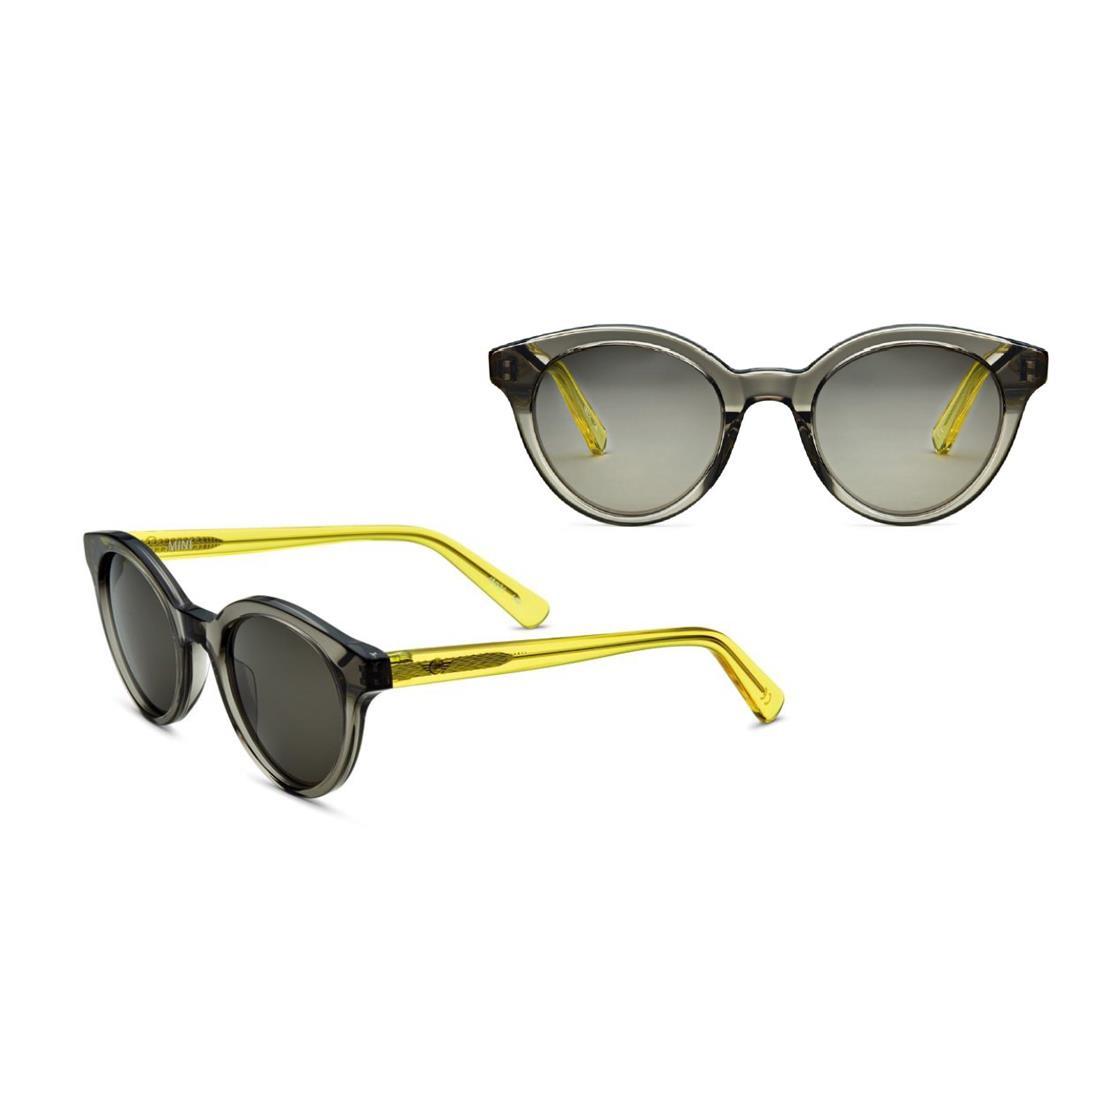 4f4f6df4f67 ShopMINIUSA.com  MINI Panto Color Block Sunglasses